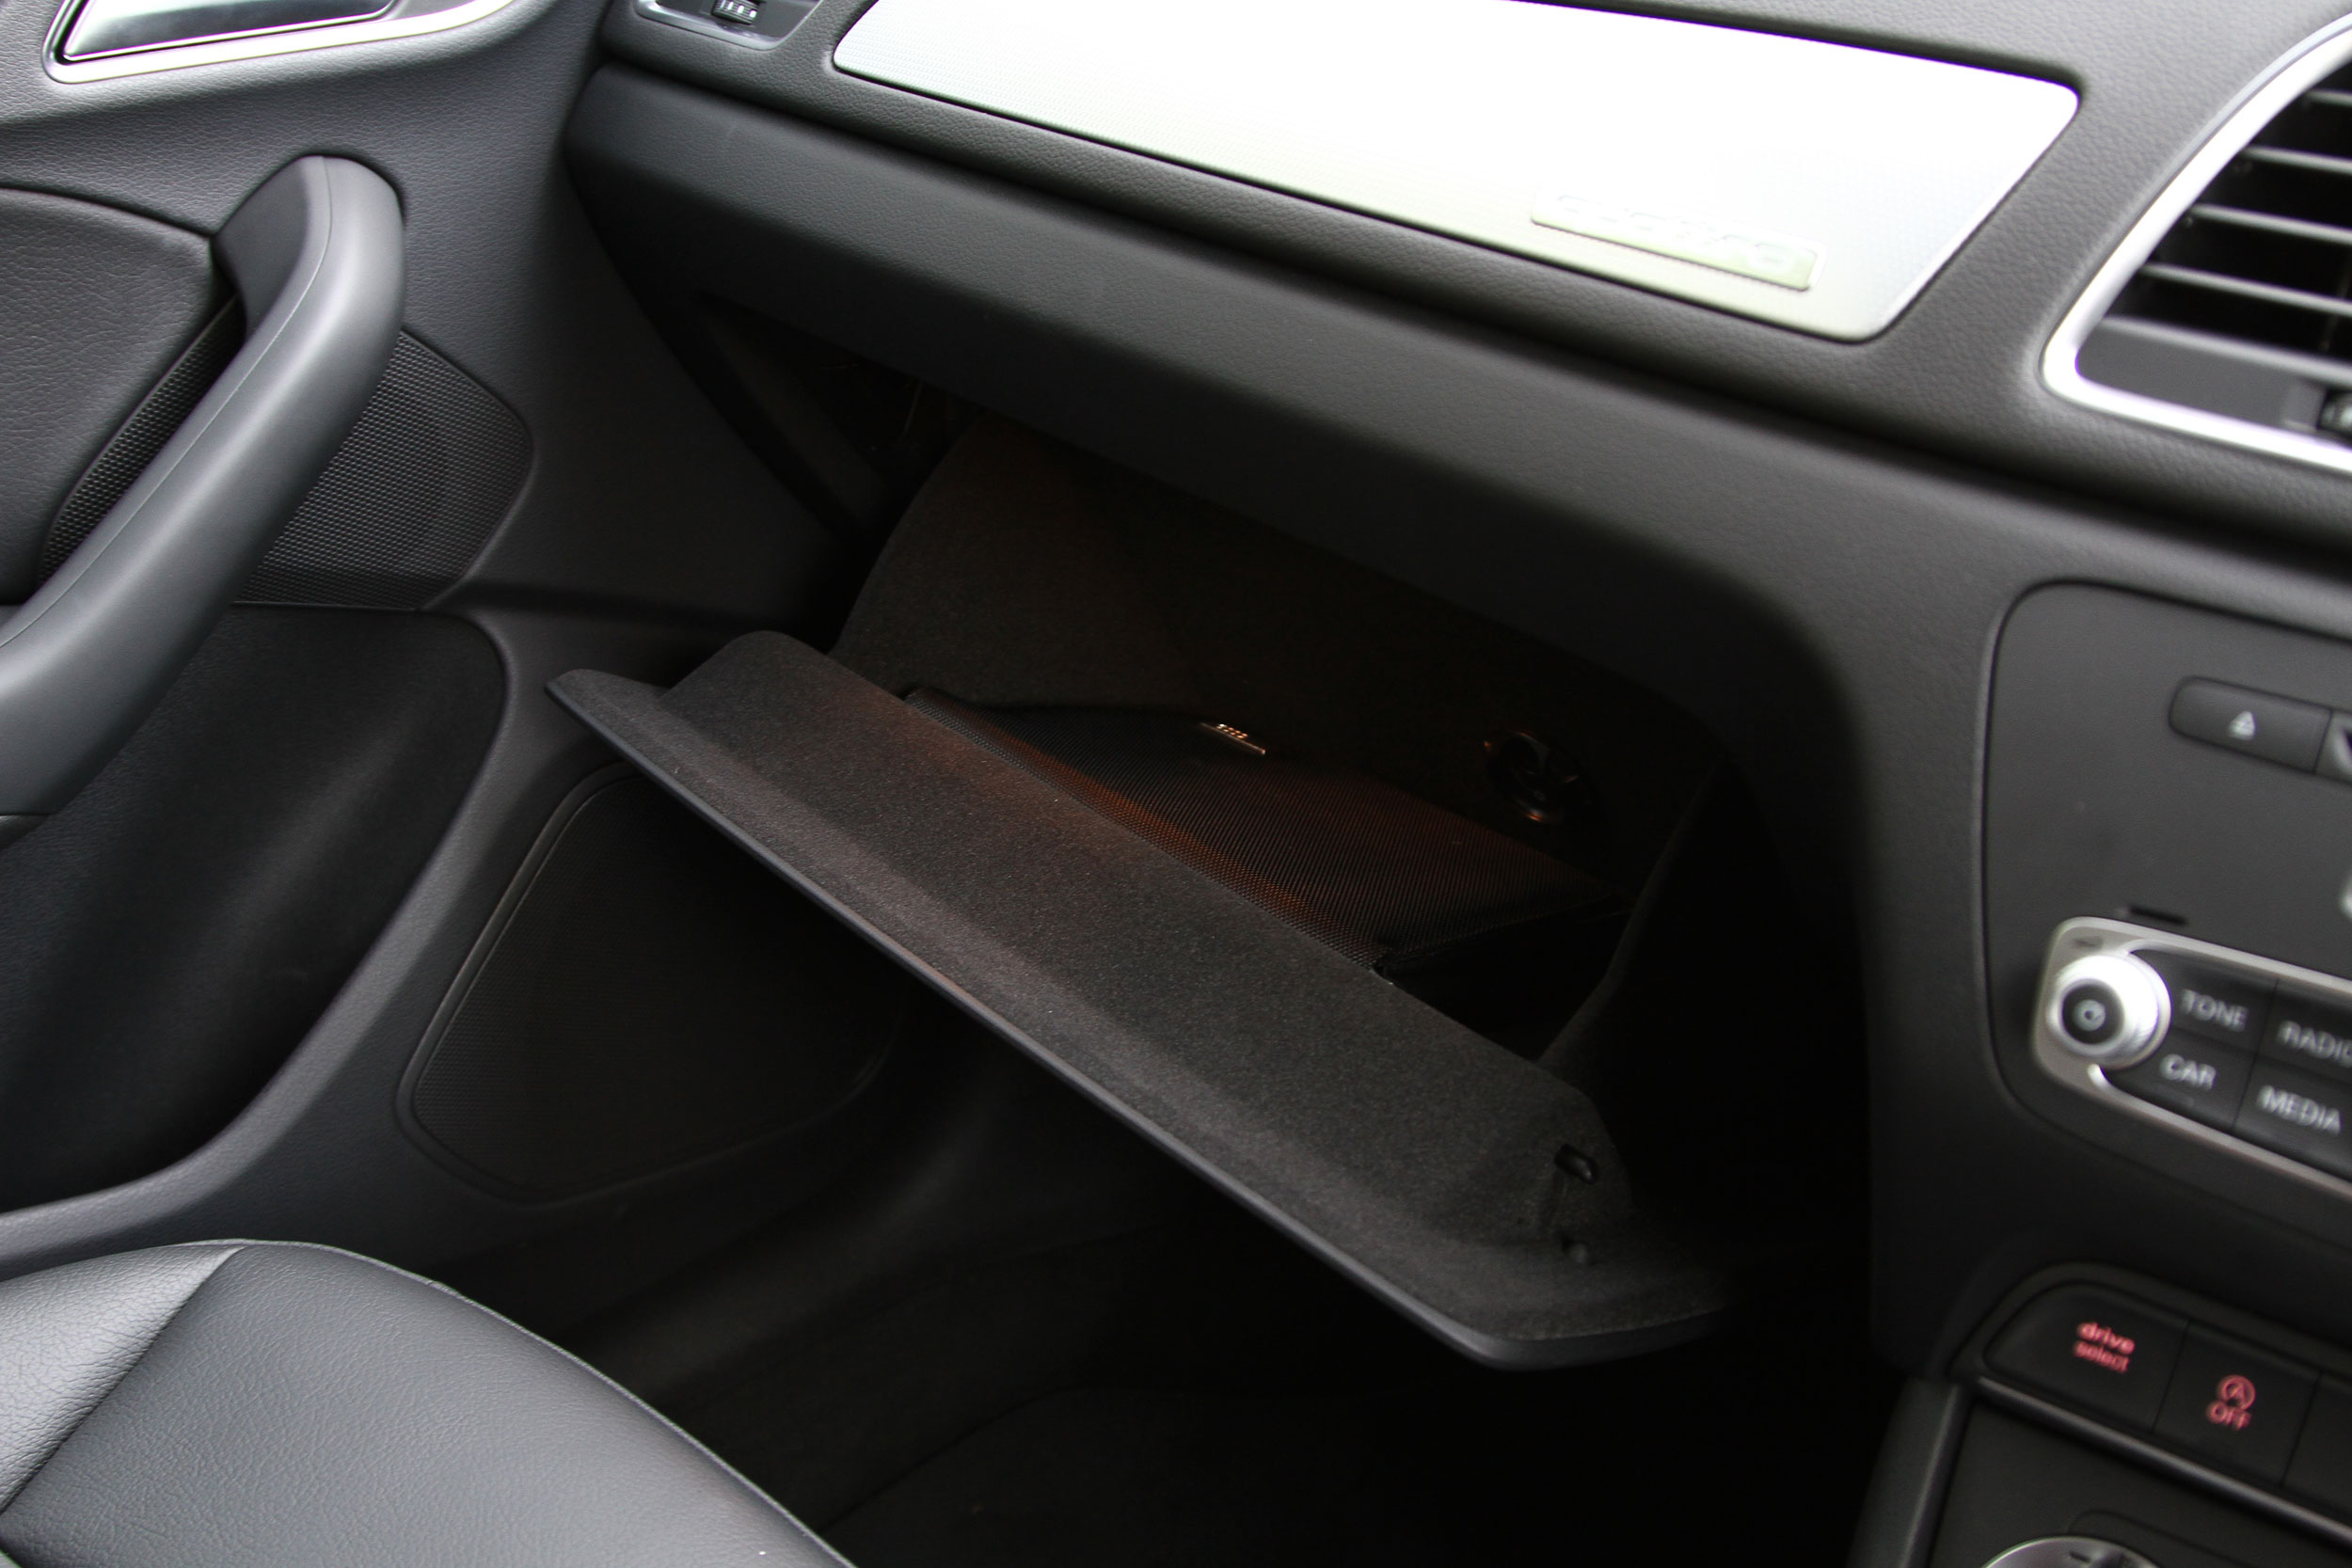 Audi Q3 Review >> Audi Q3 2.0 TFSI 170hp Test Drive Review Paul Tan - Image 115340